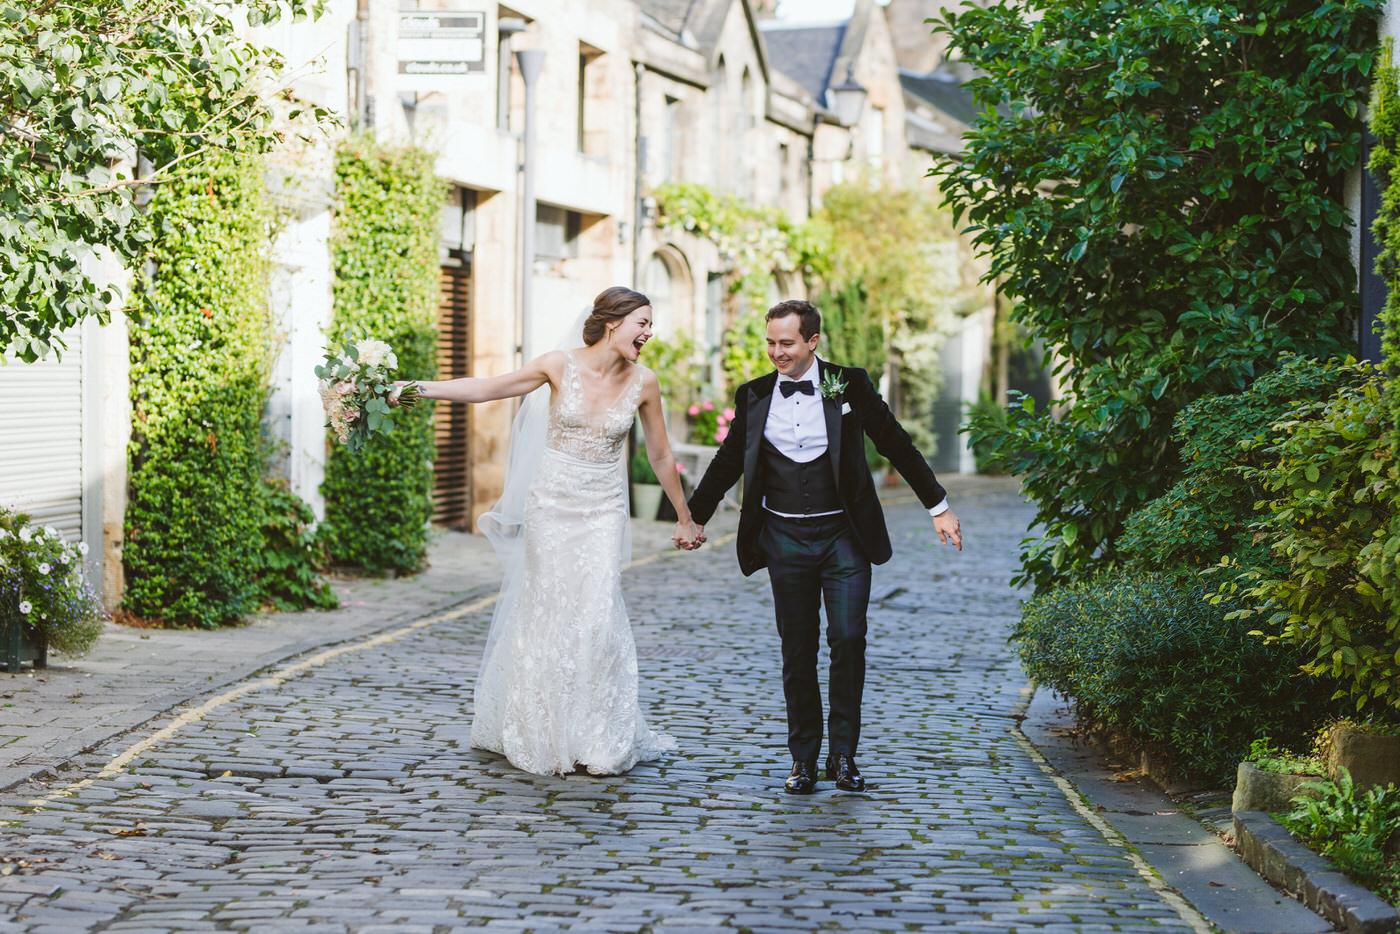 Wedding portraits - Get your wedding timeline right!